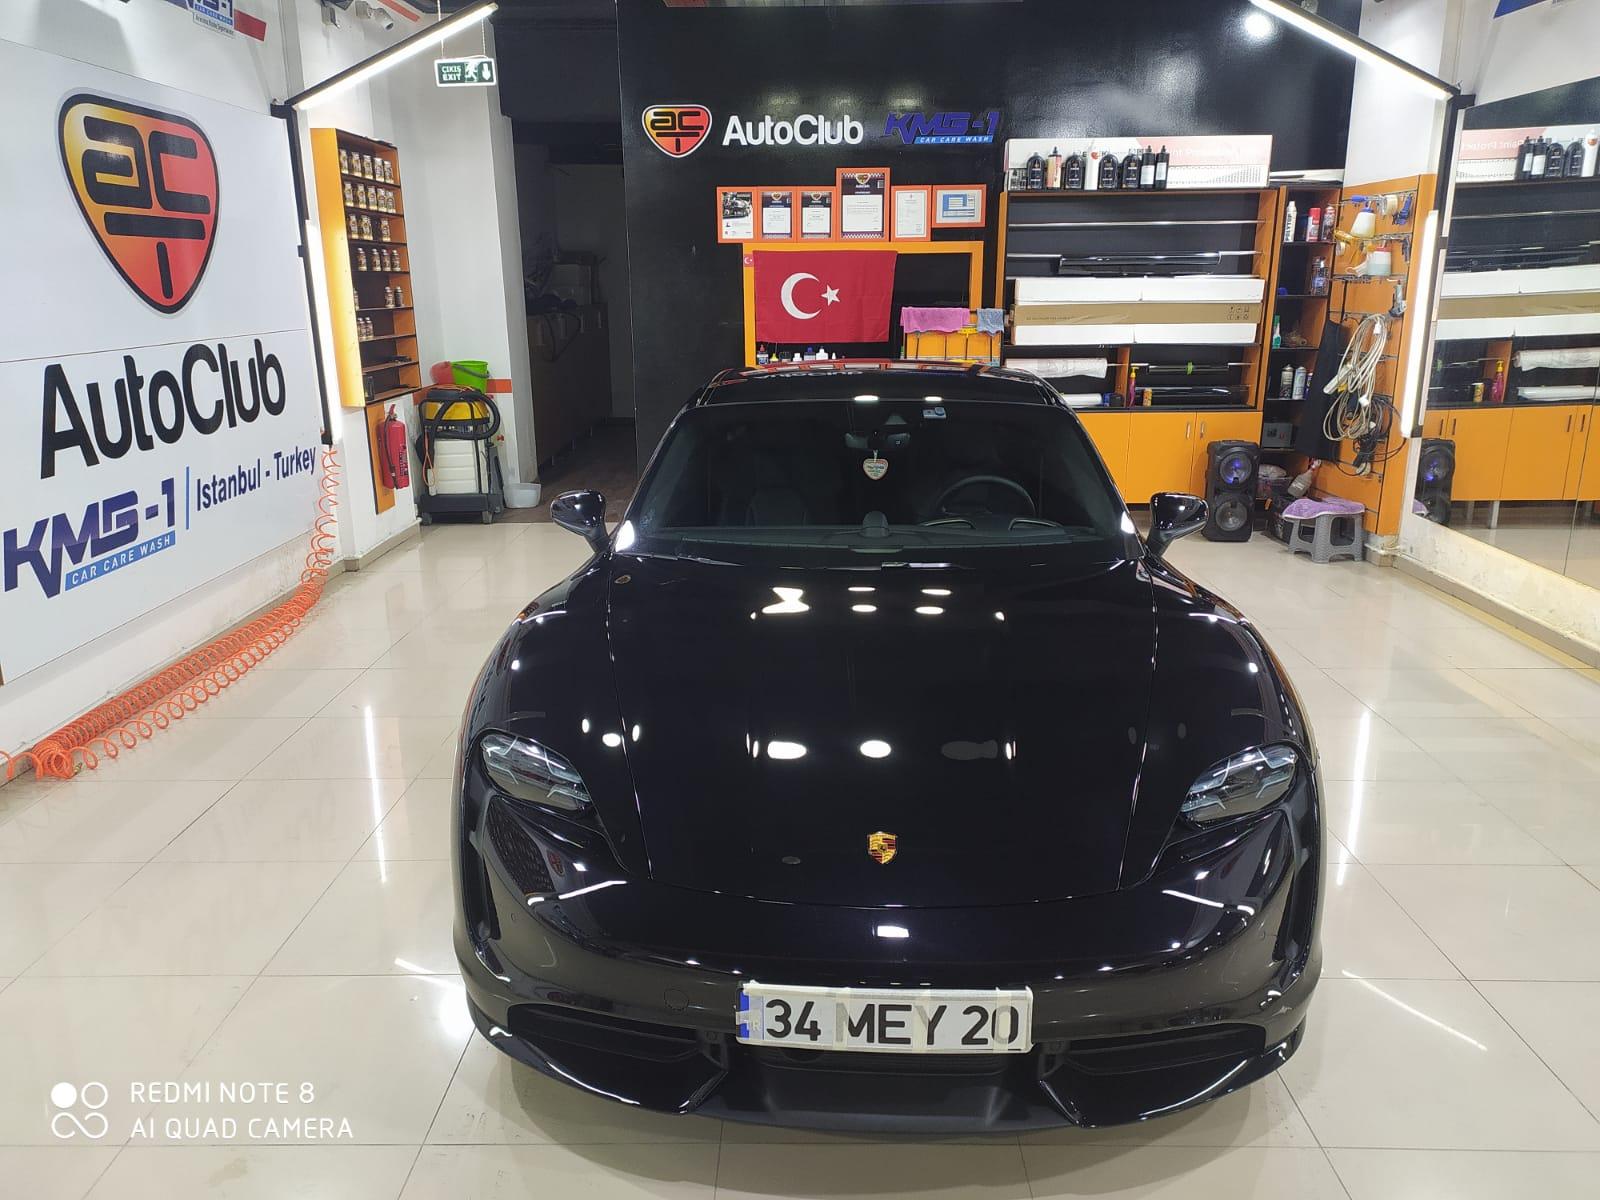 AutoClub CCP - İstanbul Ümraniye Şerifali